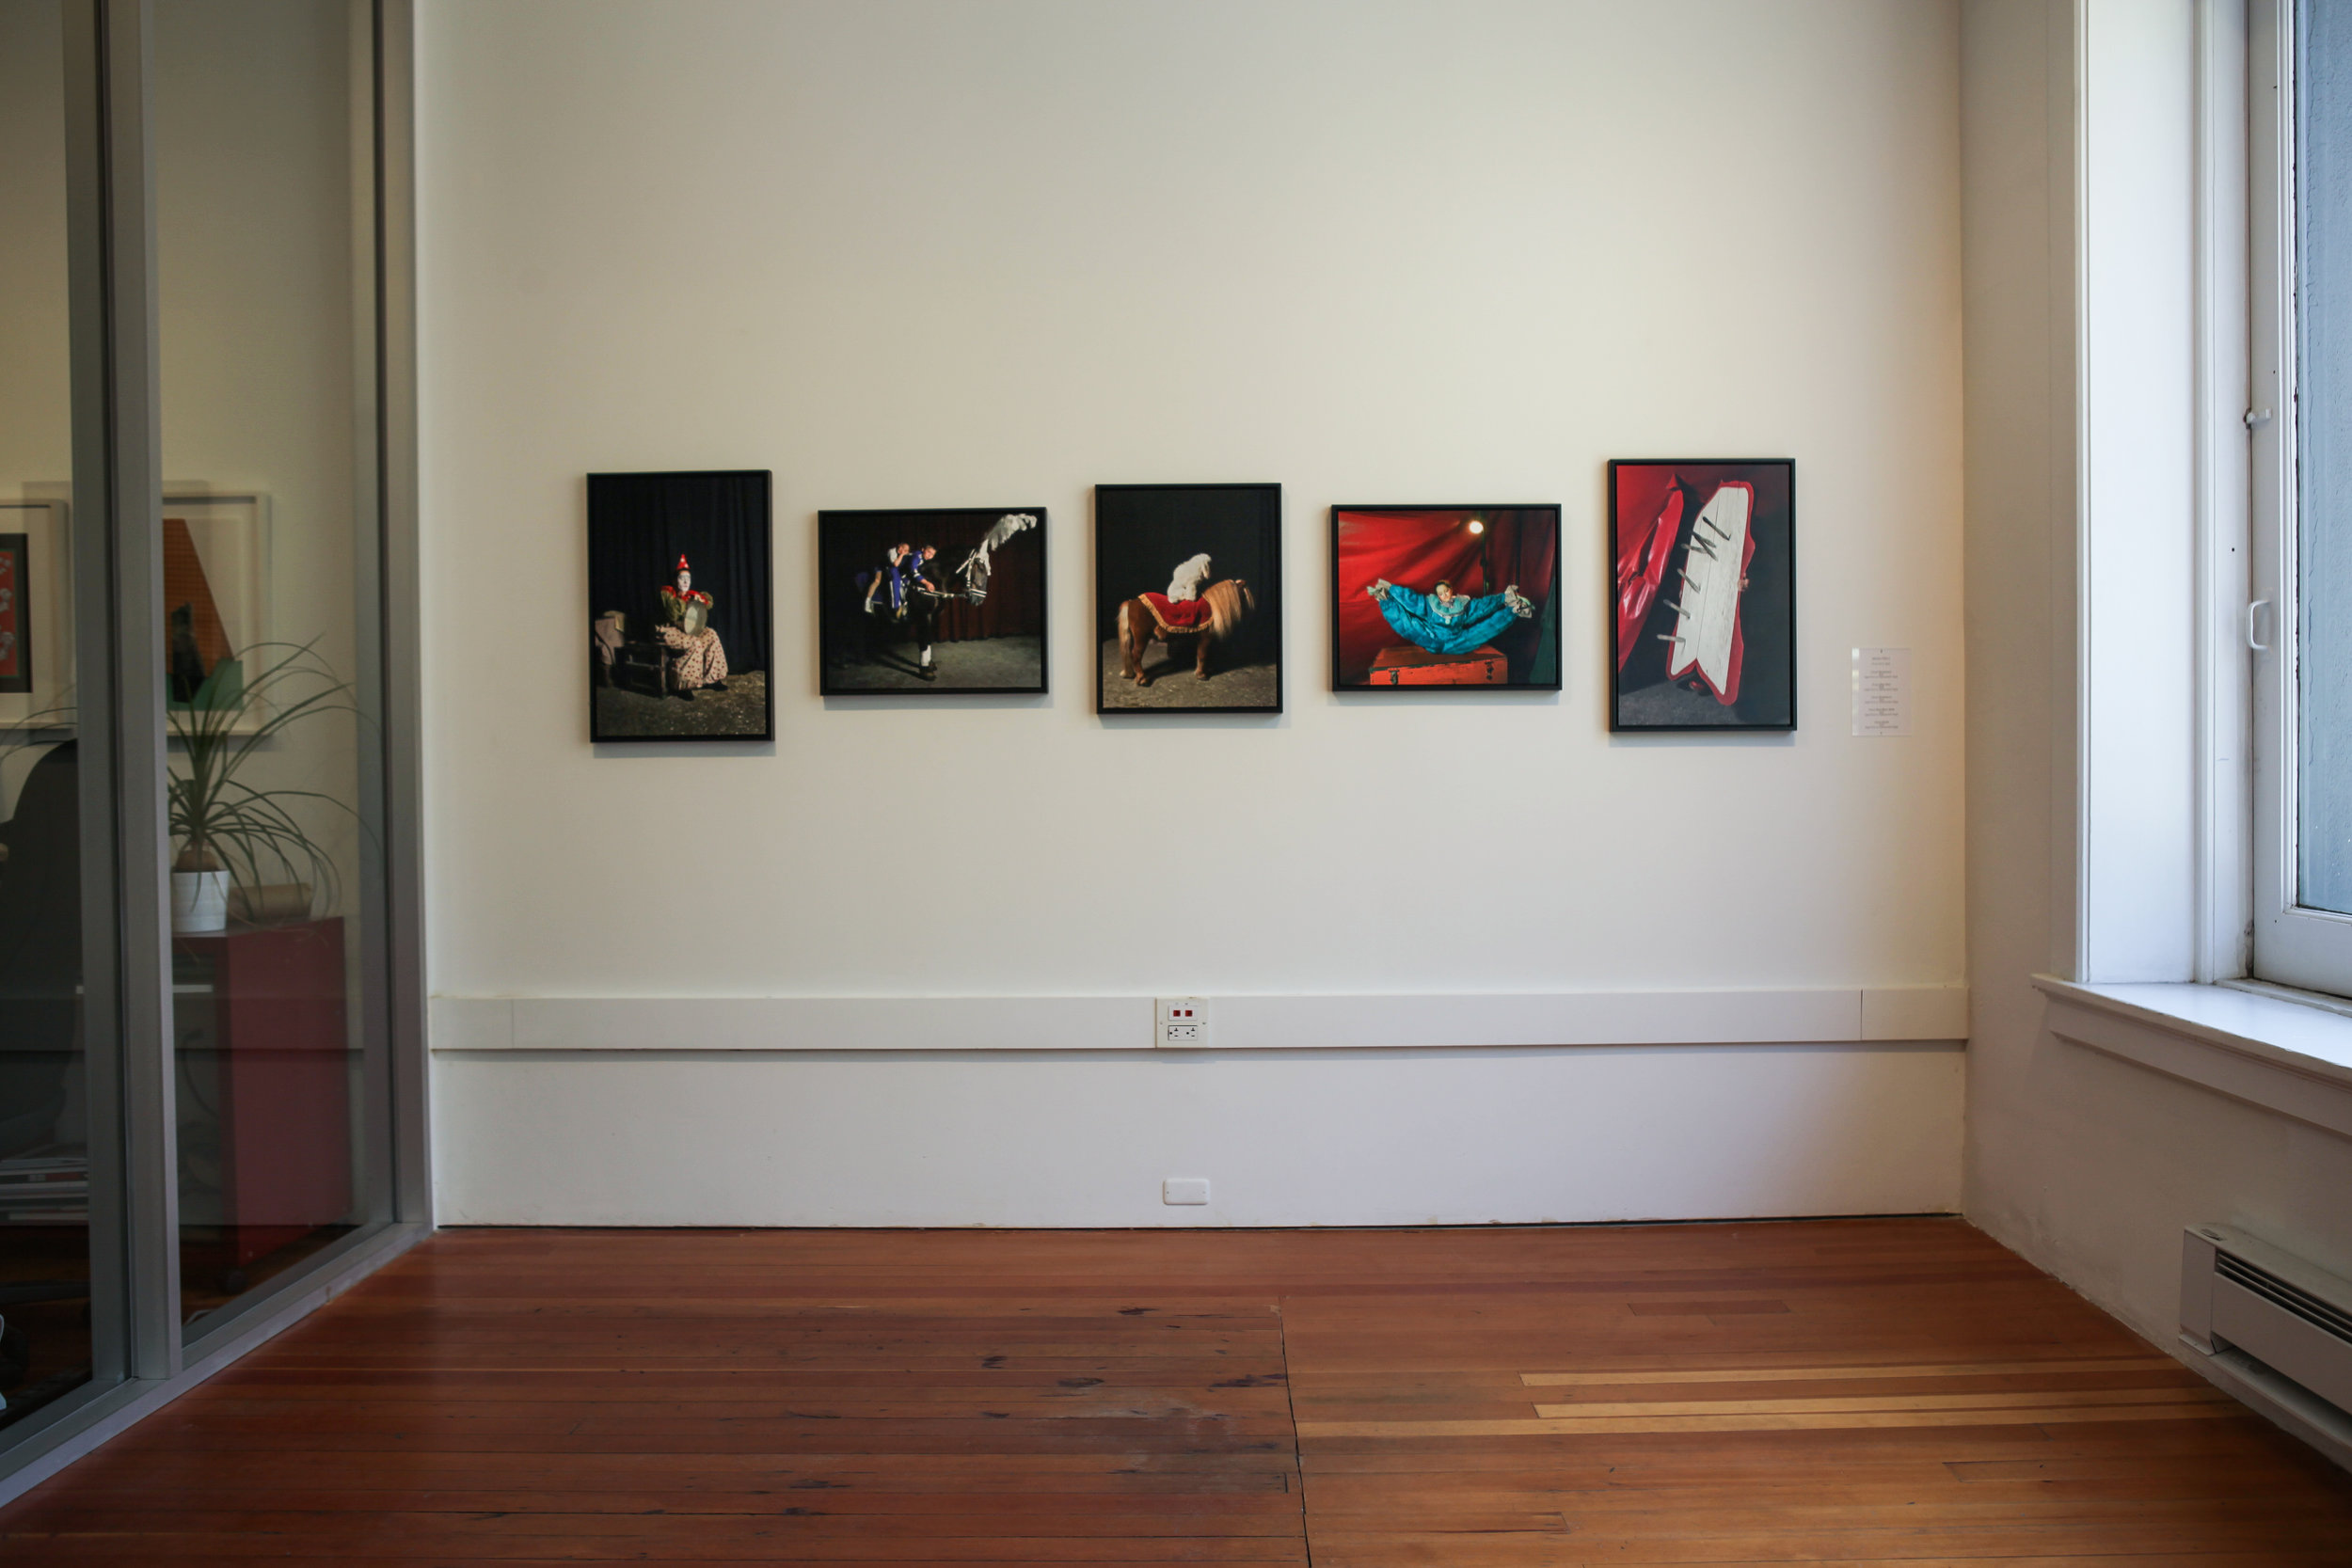 Installation view of Wiesje Peels' series Circus Renaissance.